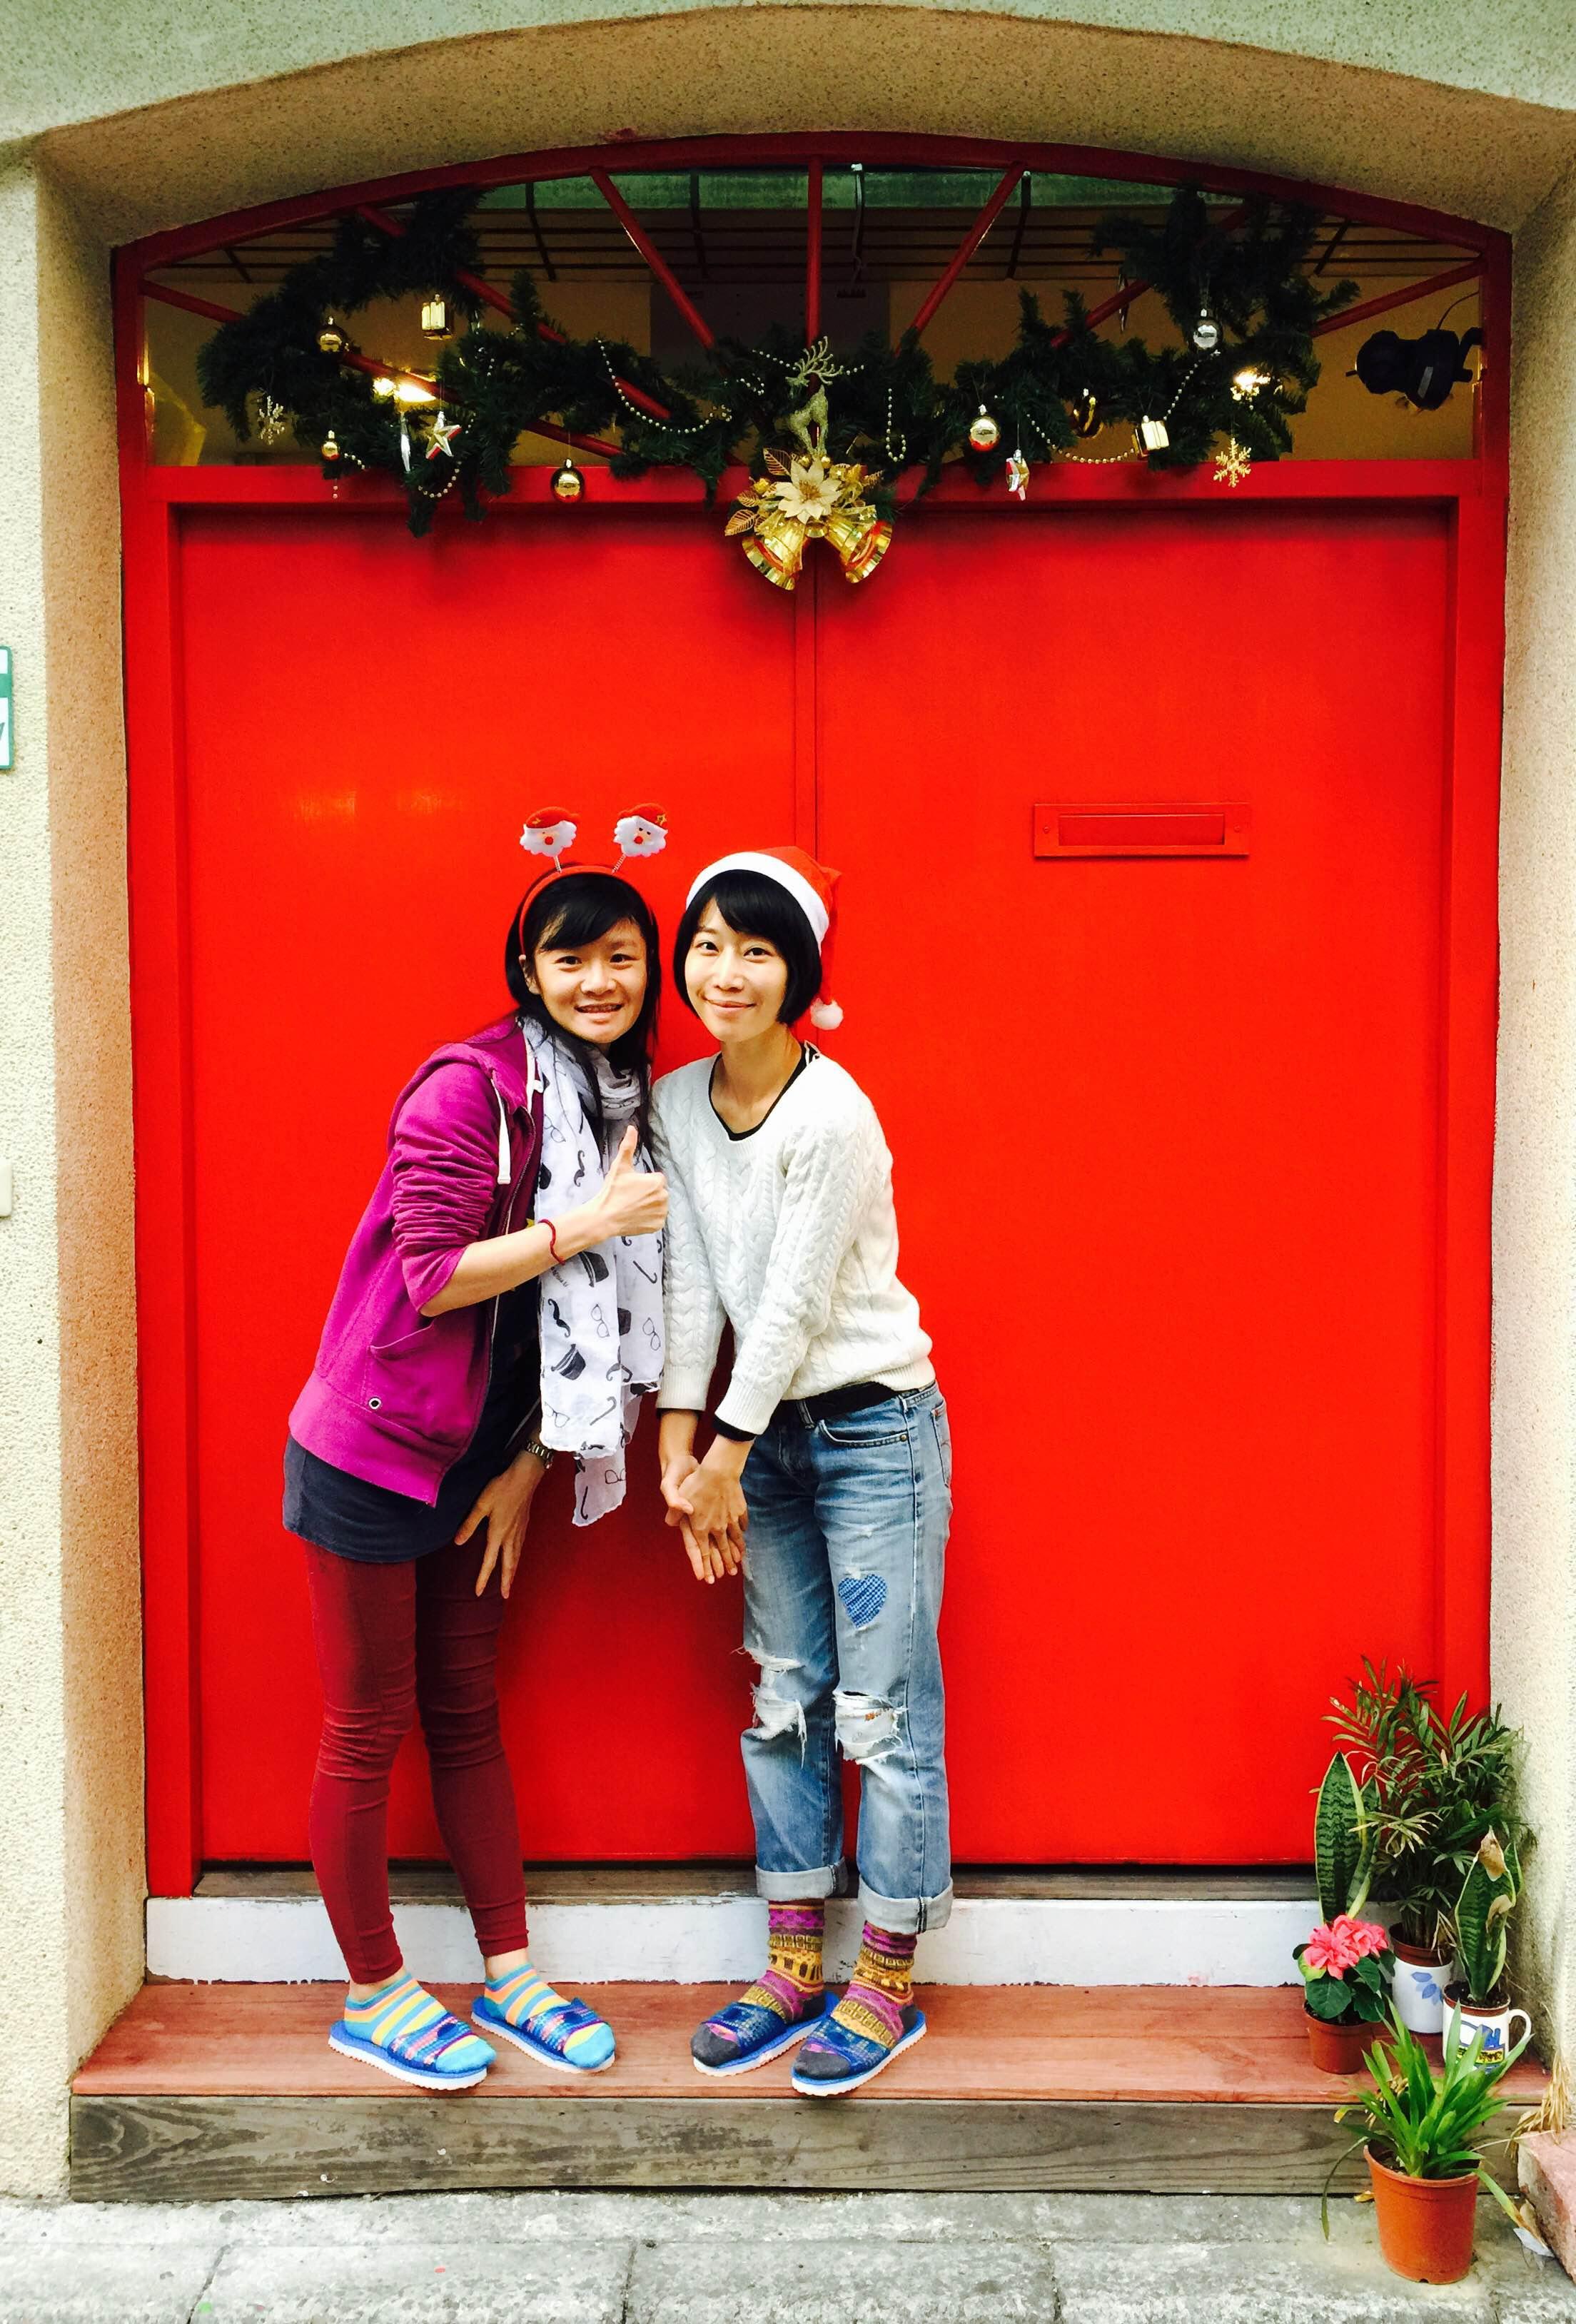 three-little-birds-taipei-taiwan-christmas-holidays-celebration-guesthouse-hostel-warm-welcoming-nightmarket-tourism-backpackers-threelittlebirdstpe